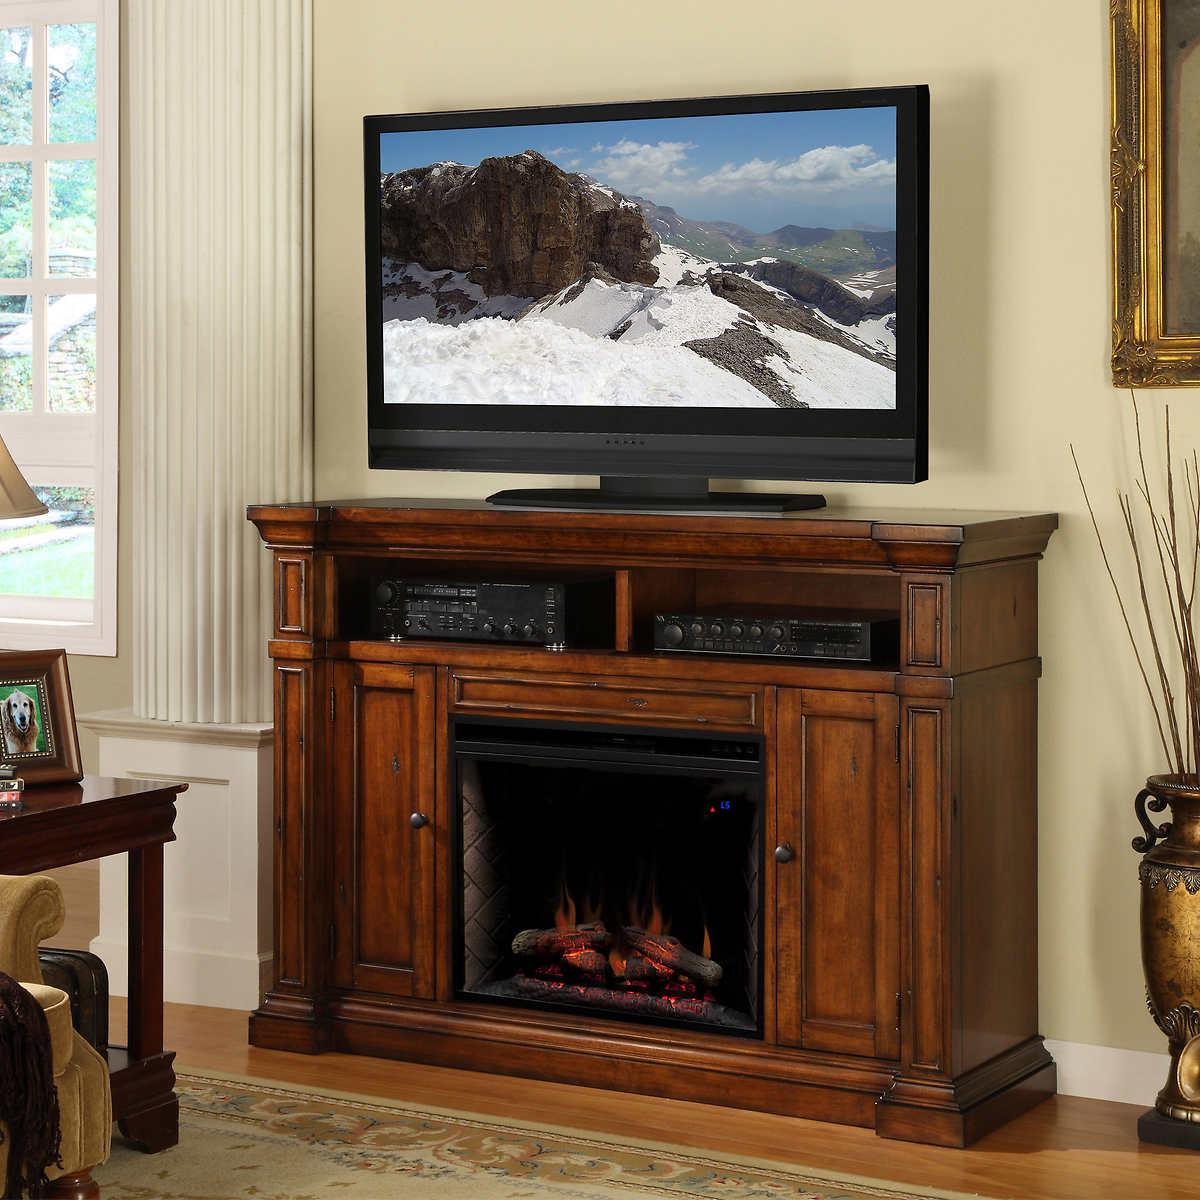 Dimplex Electric Fireplaces Costco - Costco electric fireplace